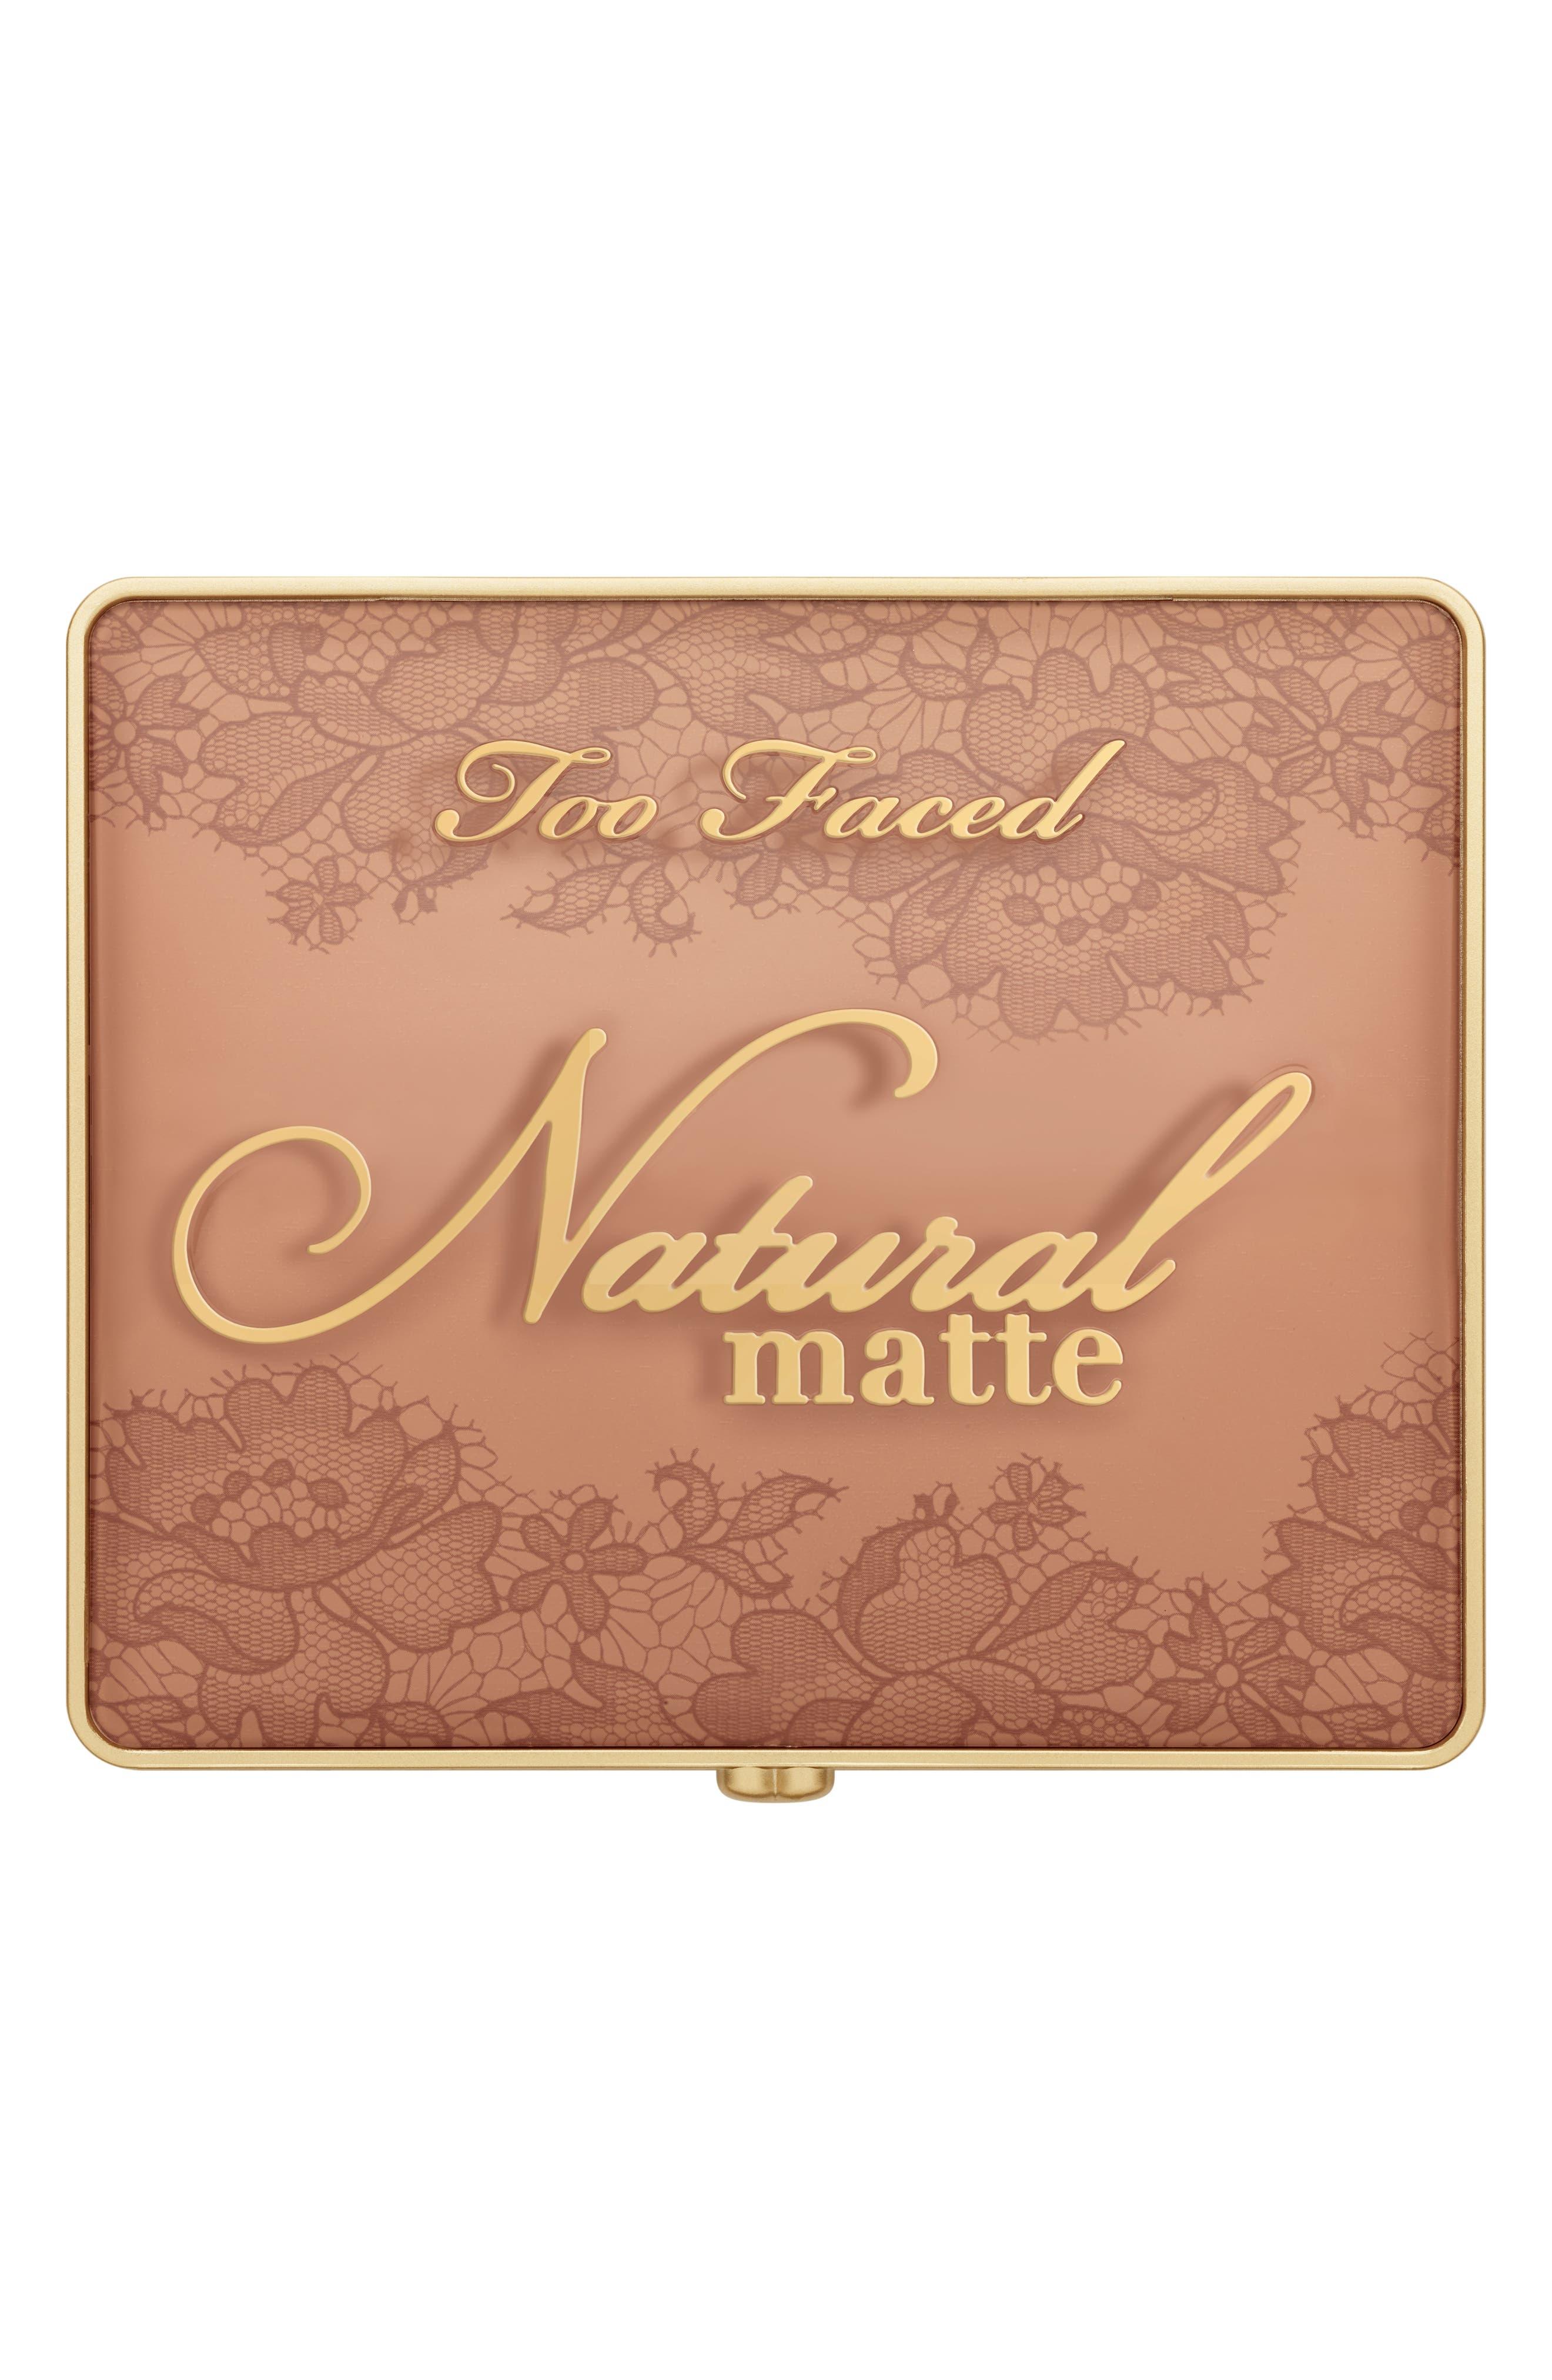 Natural Matte Eyeshadow Palette,                             Alternate thumbnail 9, color,                             No Color